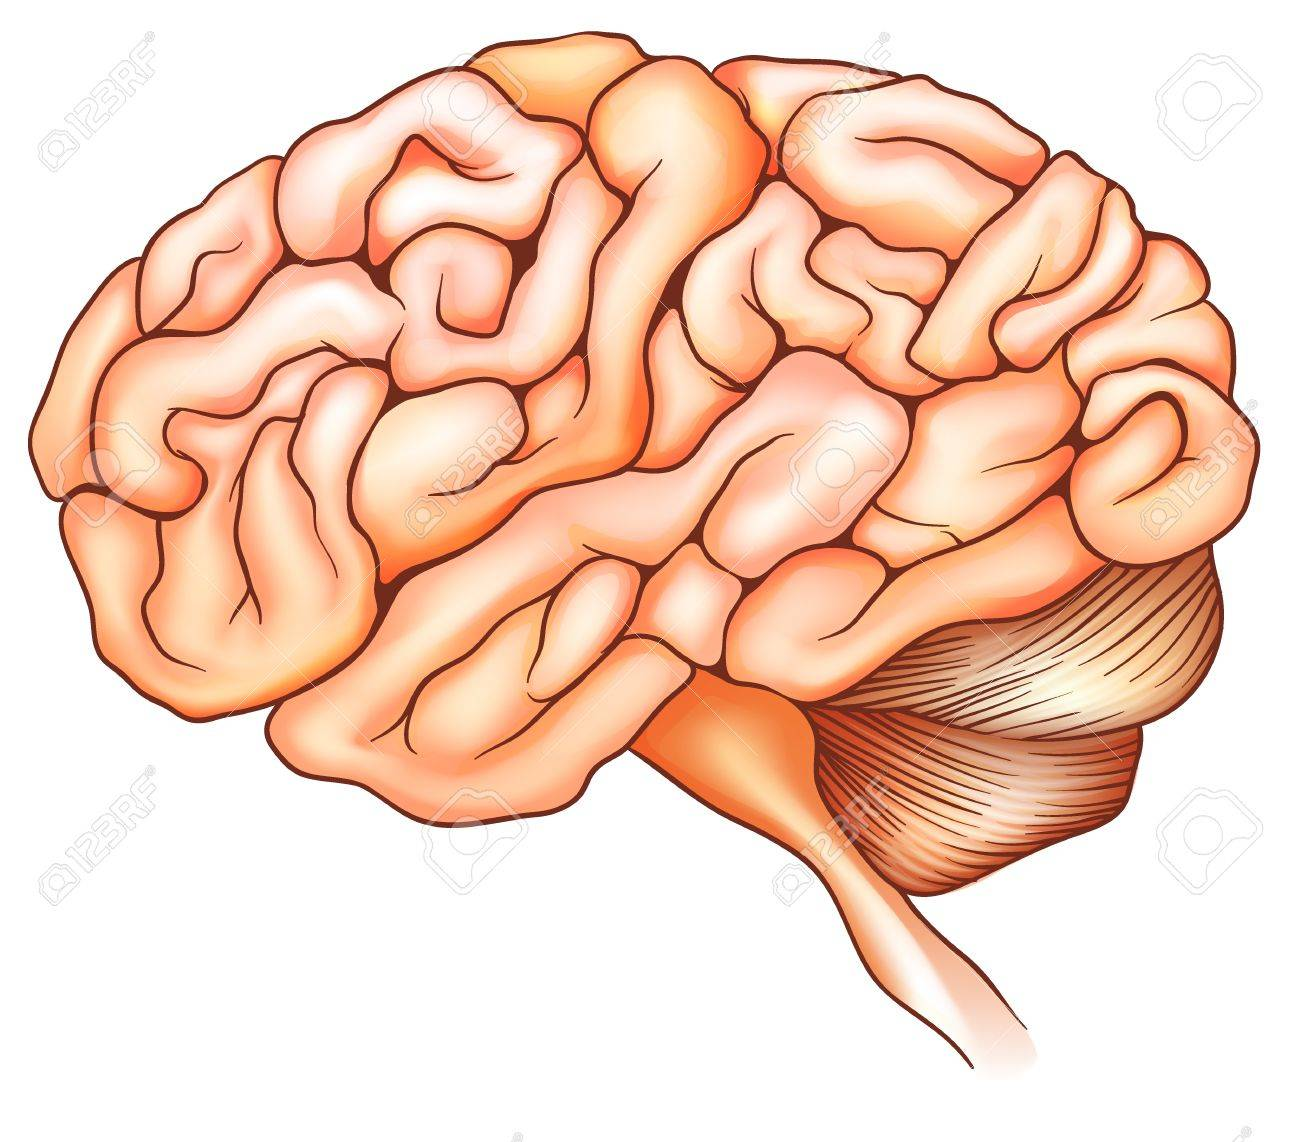 An illustration of the human brain Stock Vector - 19929953